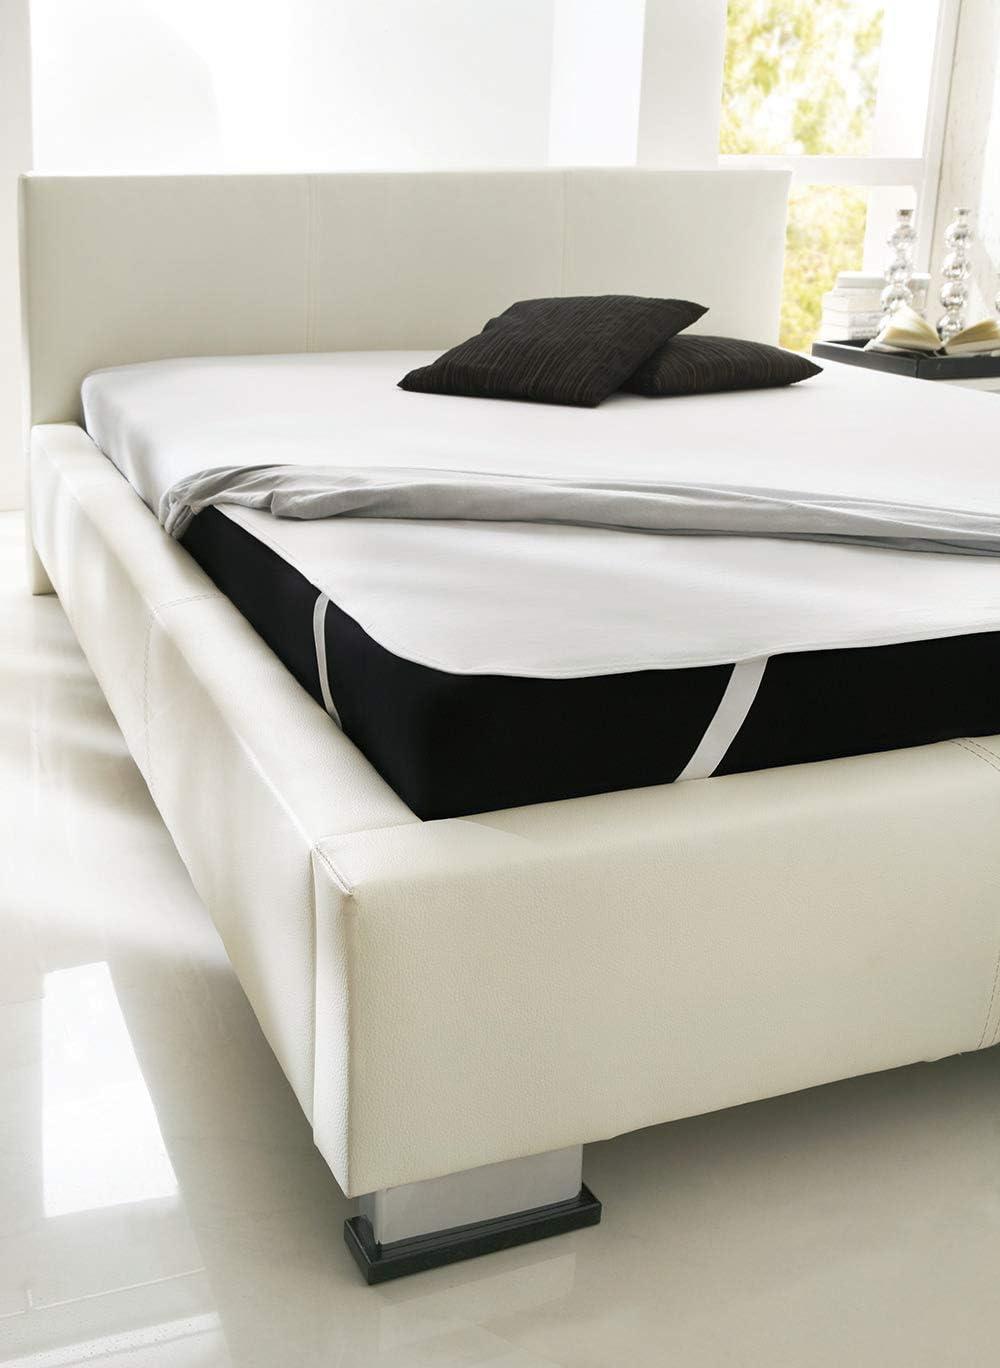 100 x 200 cm Dormisette Cotton Mattress Topper COTTON white